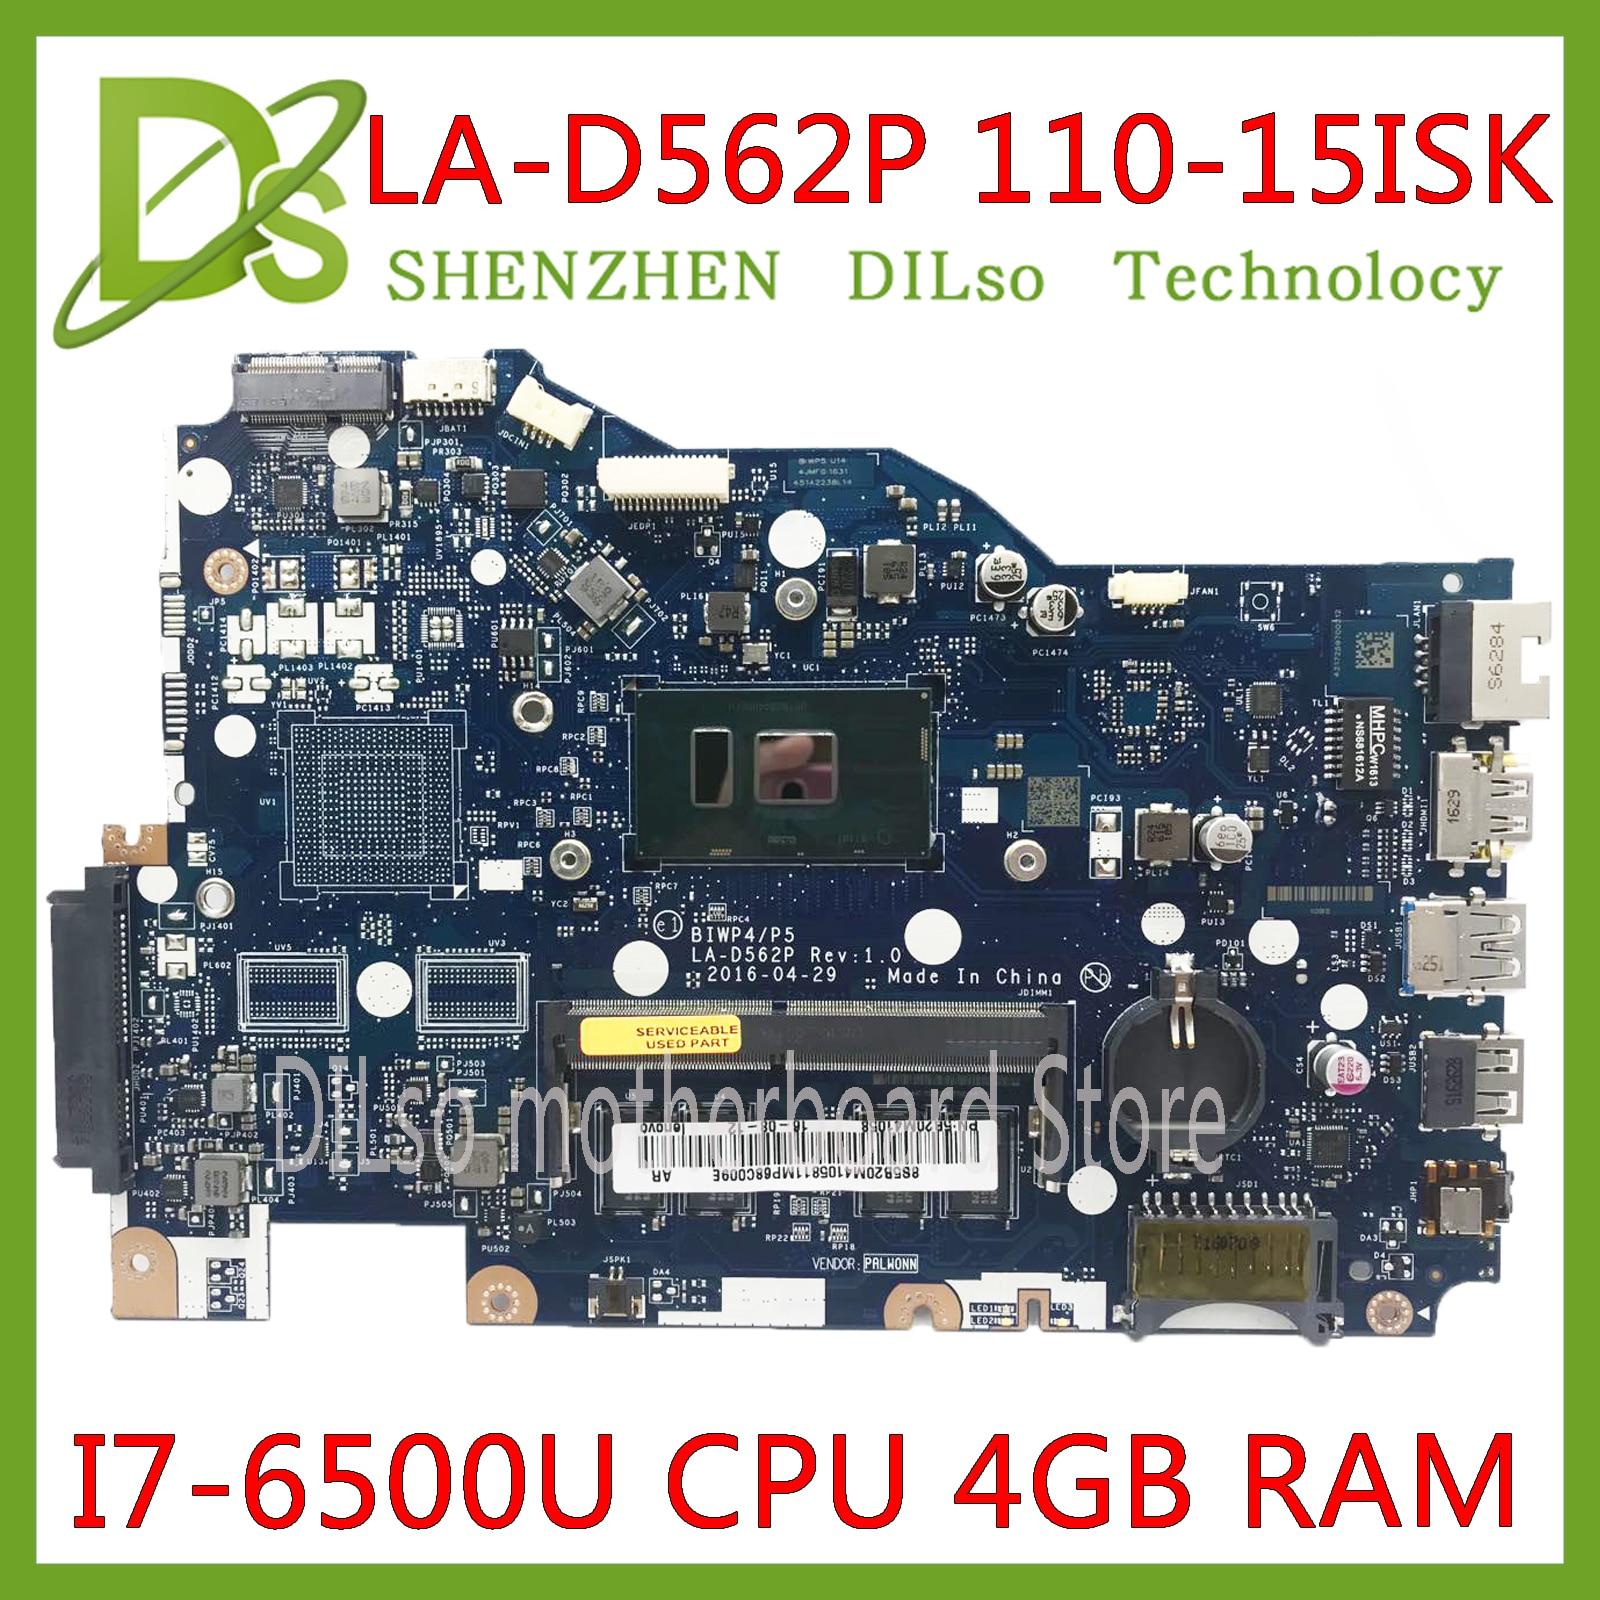 KEFU LA-D562P Mainboard For Lenovo 110-15isk Laptop Motherboard LA-D562P I7-6500U CPU 4GB Test Work 100% Original